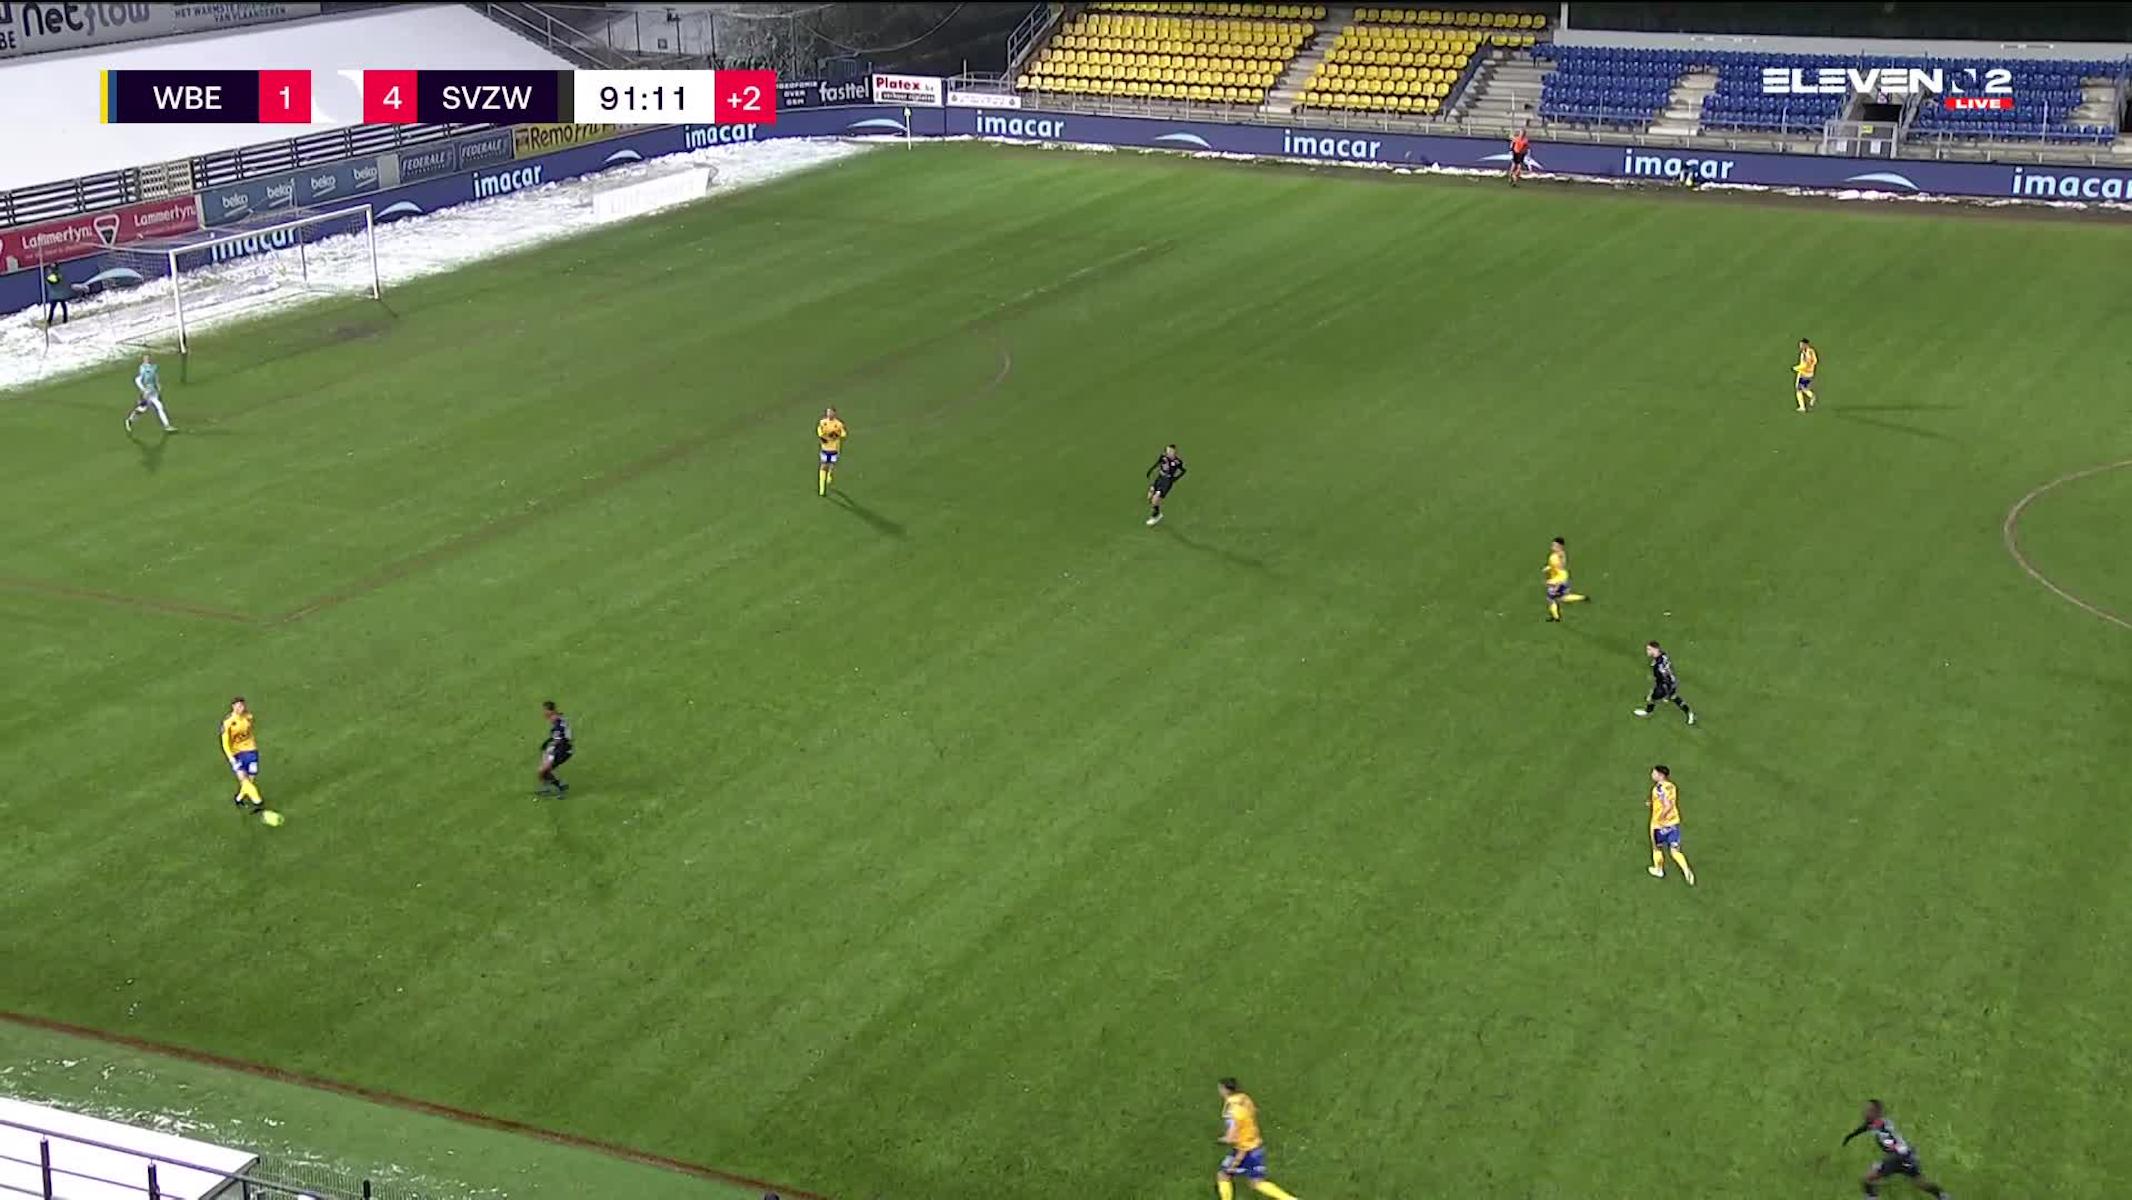 Doelpunt Panos Armenakas (Waasland-Beveren vs. SV Zulte Waregem)